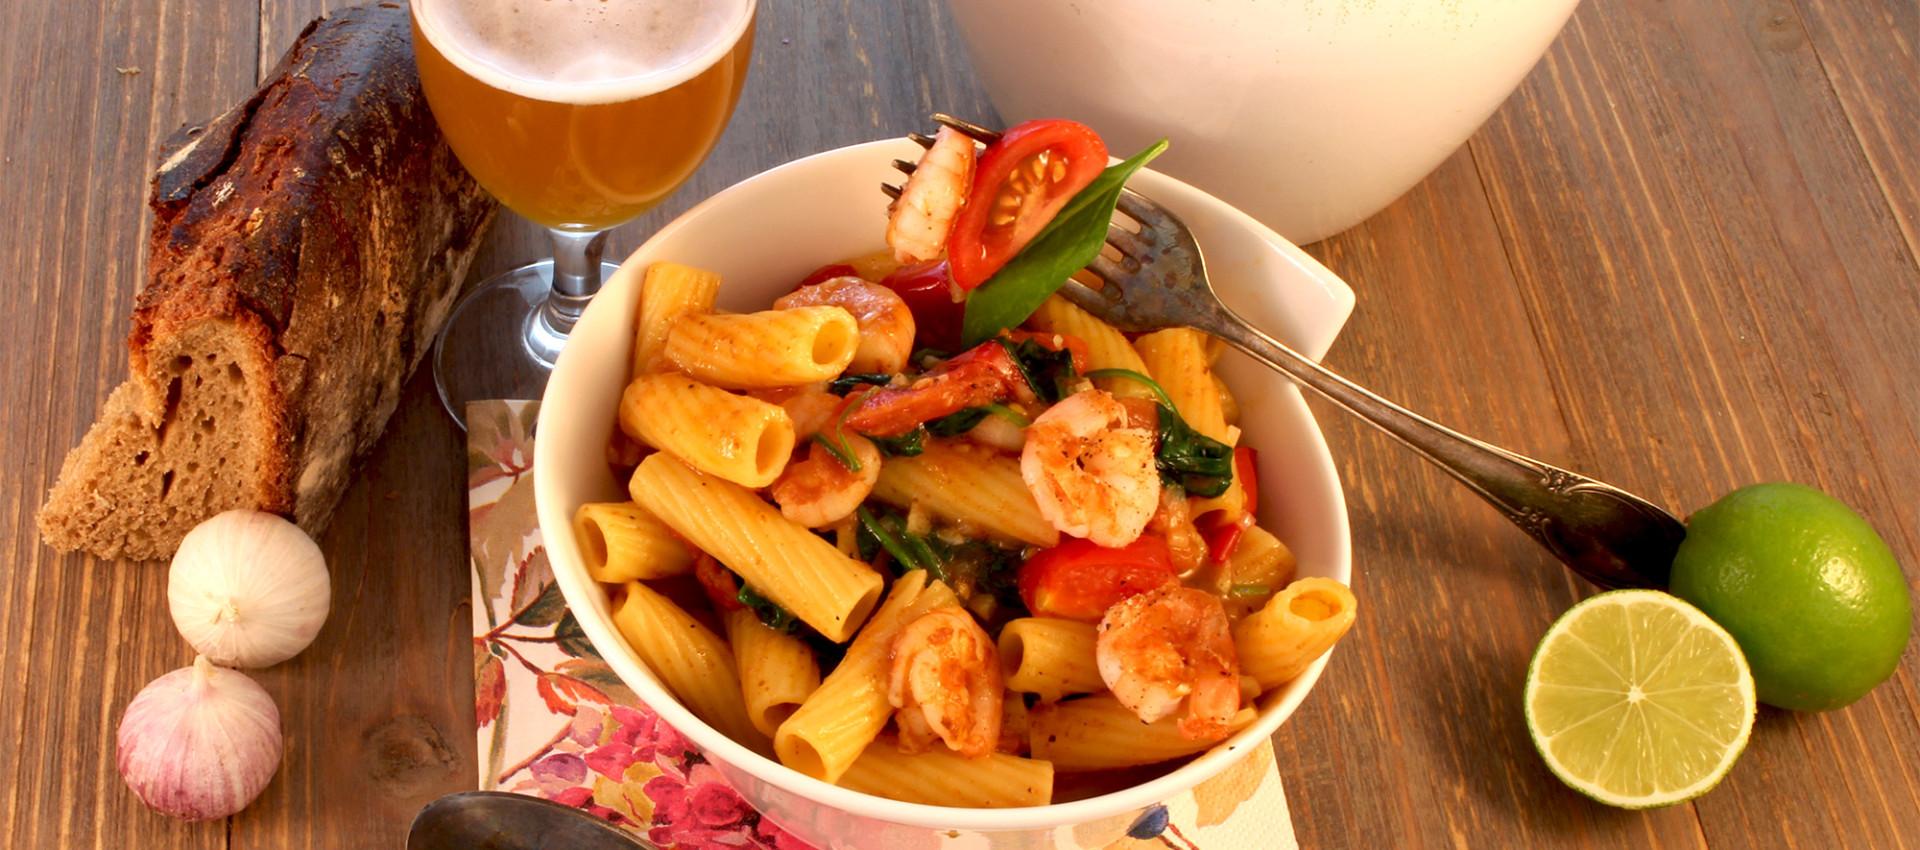 Rezept für Pasta mit Schrimps, Garnelen, Blattspinat, Kirschtomaten in Biersauce - Kochbock.de